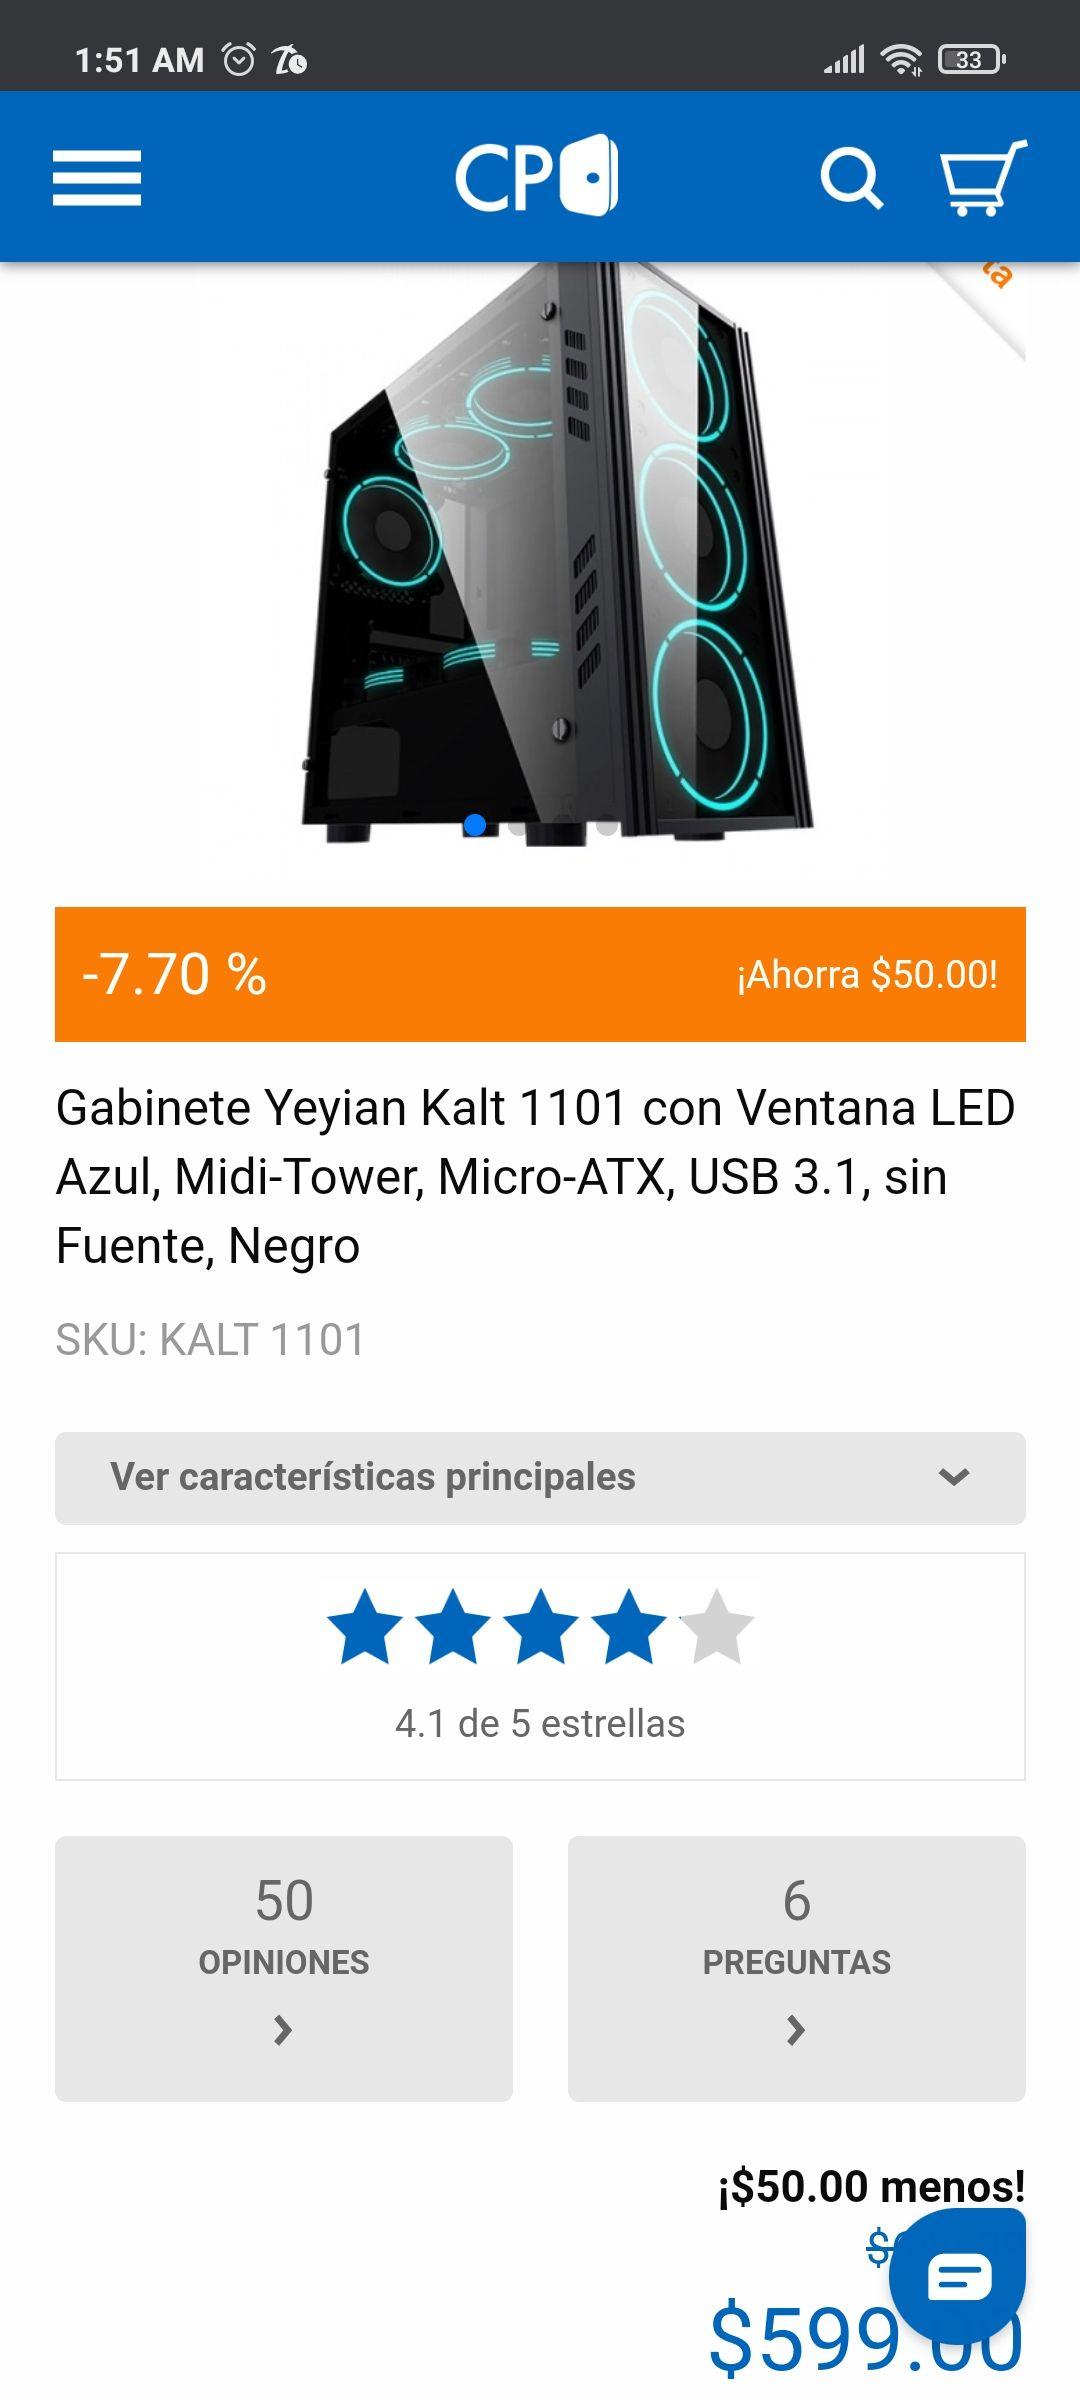 Cyberpuerta: Gabinete Yeyian Kalt 1101 con Ventana LED Azul, Midi-Tower, Micro-ATX, USB 3.1, sin Fuente